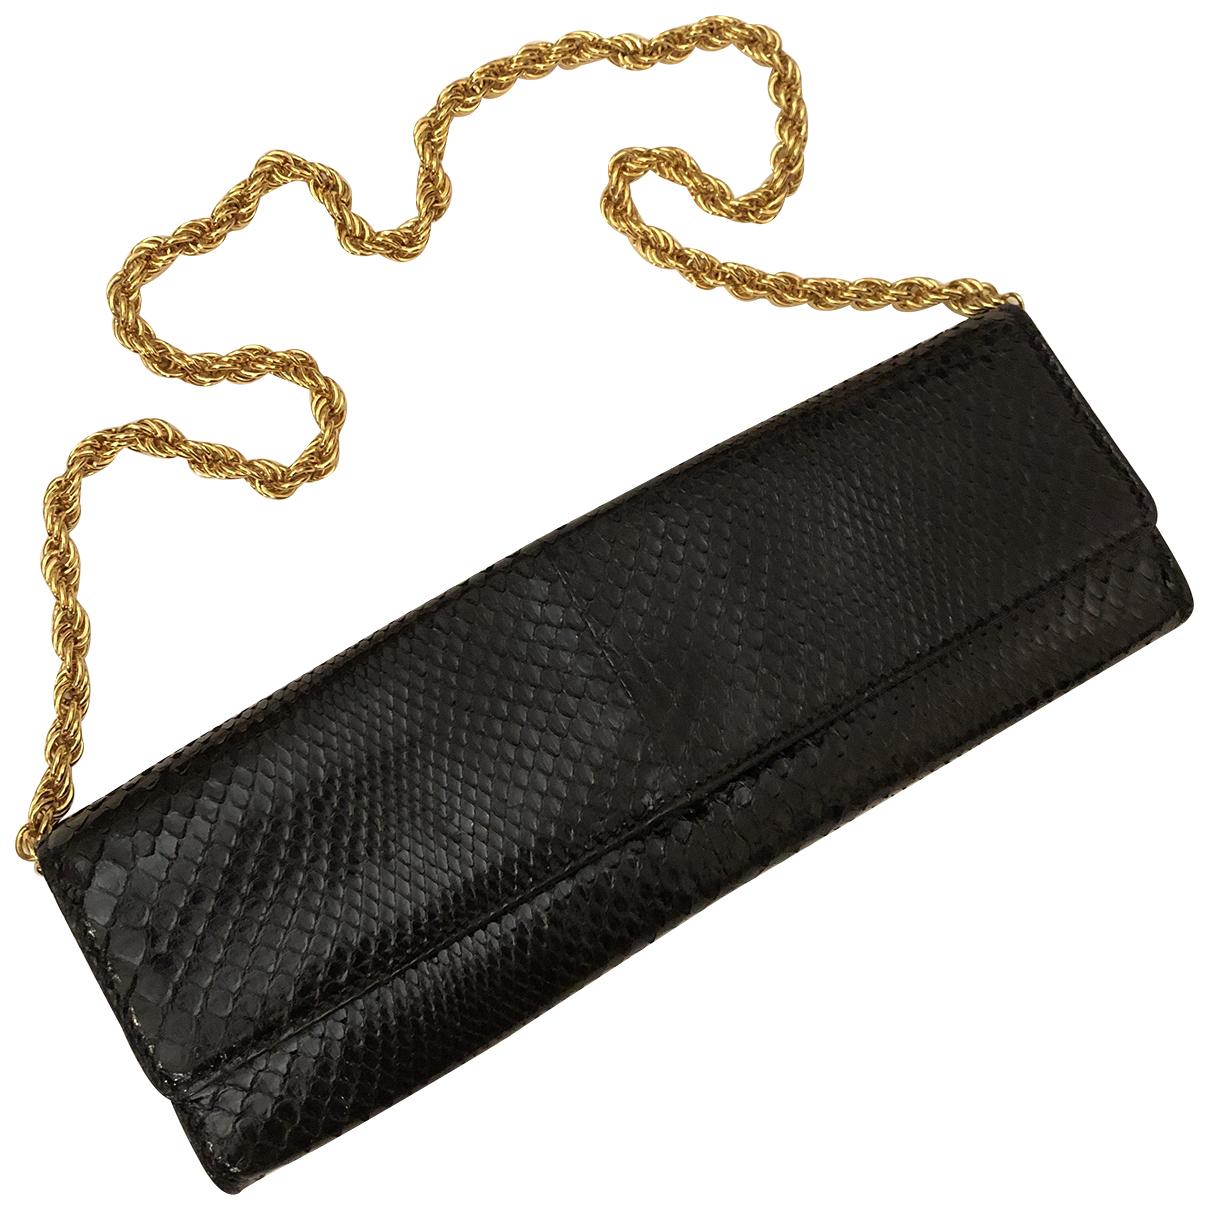 Roberto Cavalli N Black Python Clutch bag for Women N